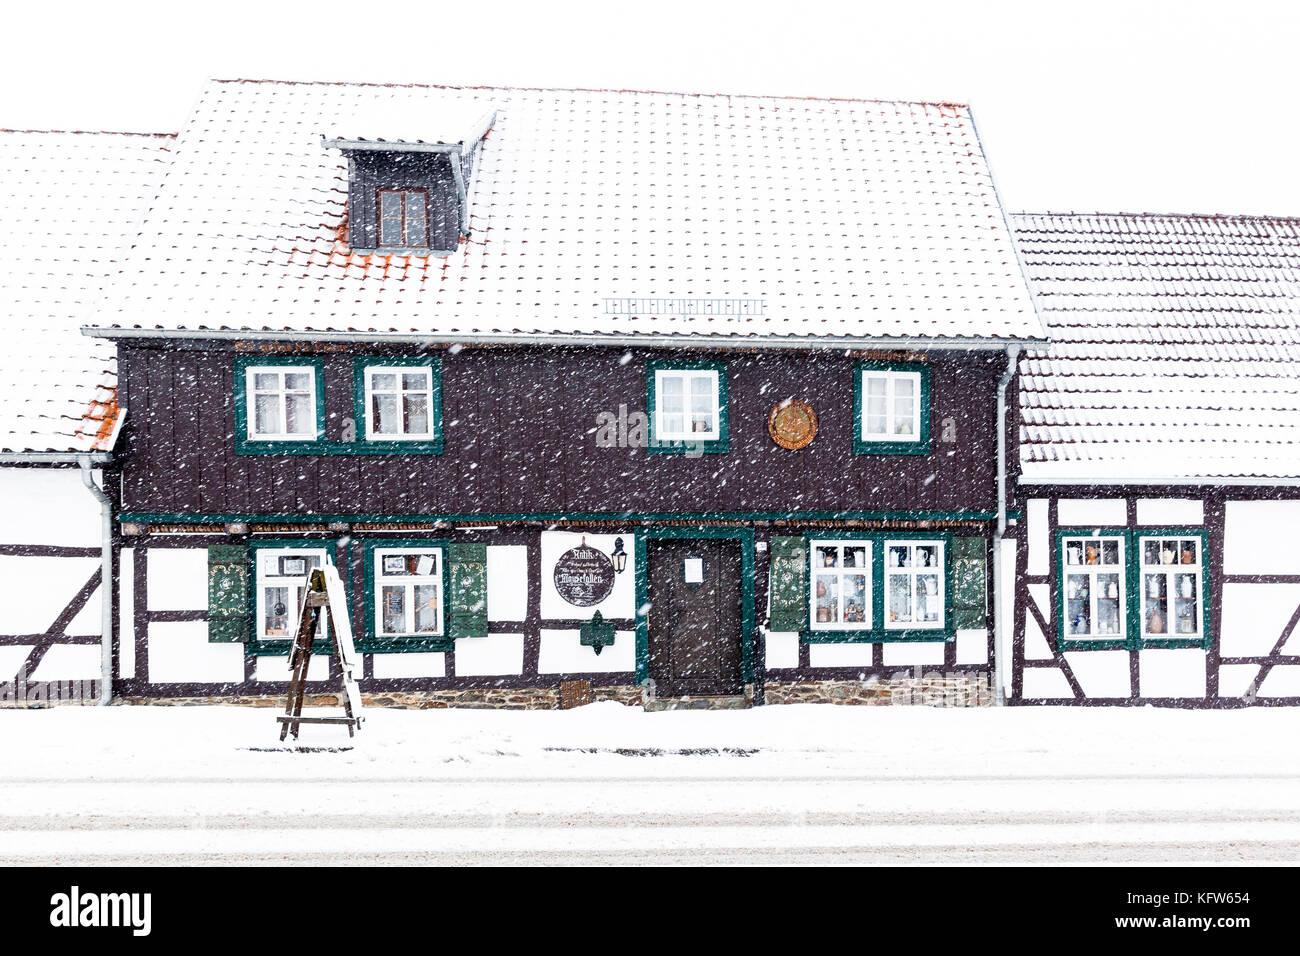 Mausefallen Museum Güntersberge im Winter Stock Photo